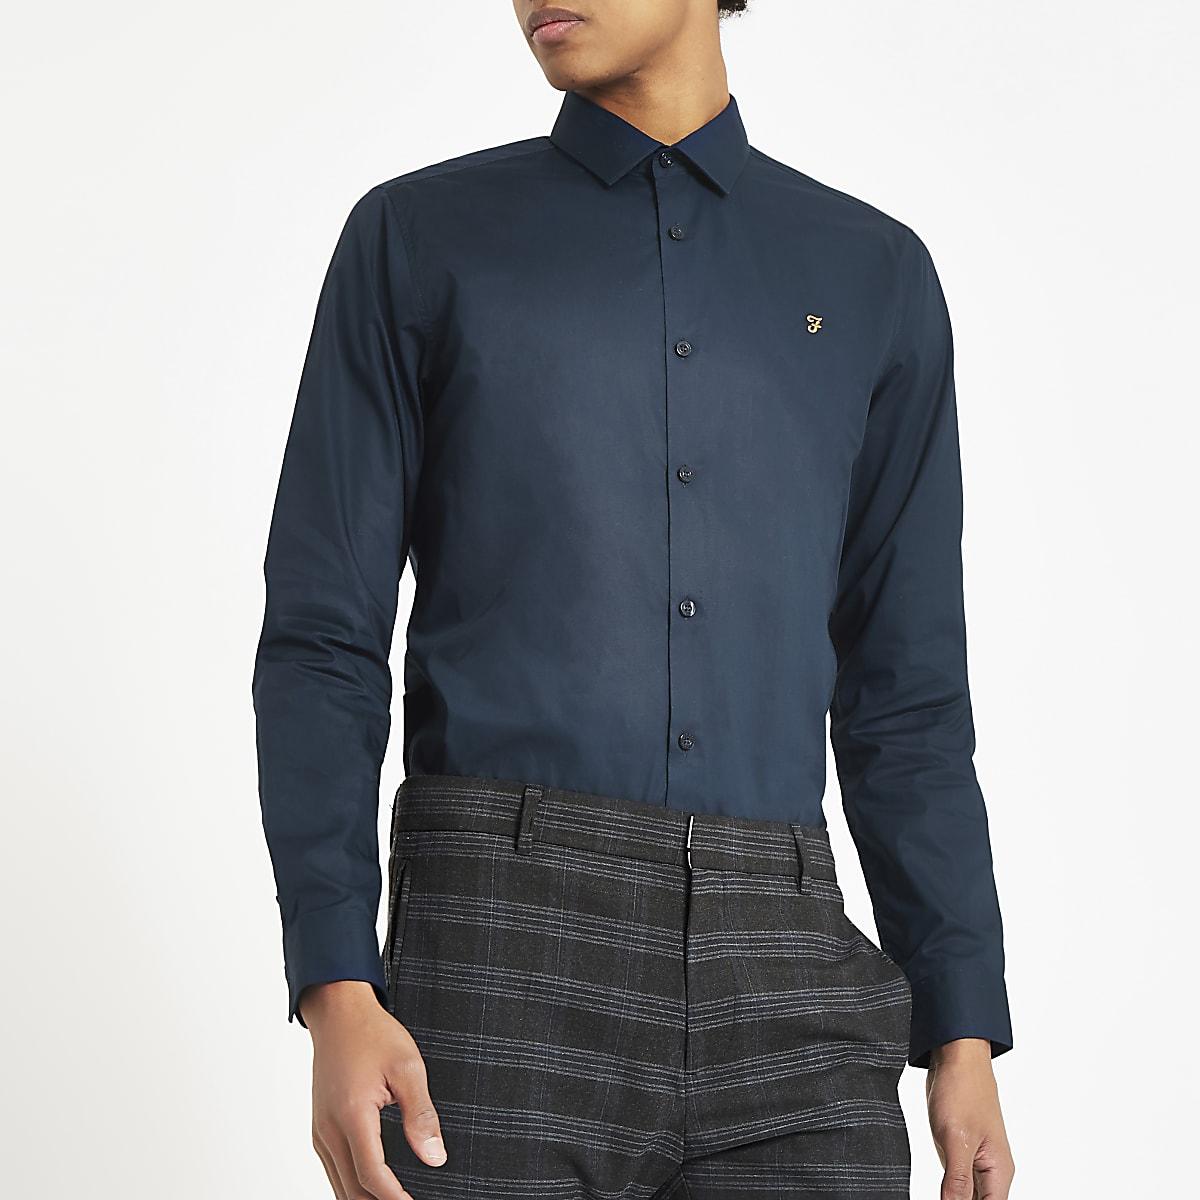 Farah - Marineblauw overhemd met lange mouwen